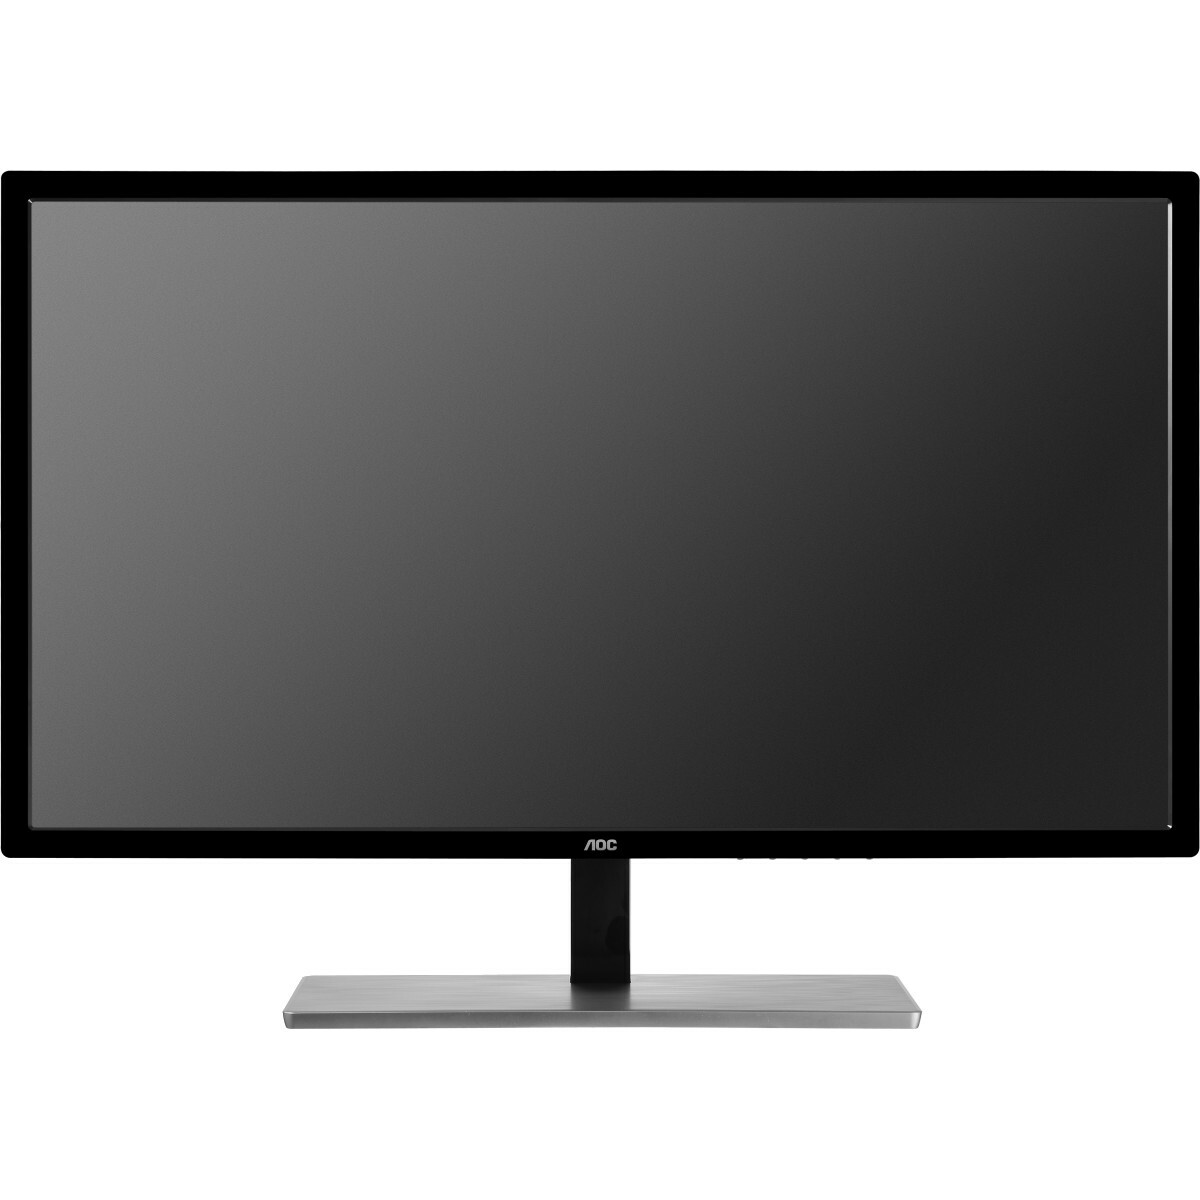 AOC Q3279VWF 31.5inch  WLED LCD Monitor - 16:9 - 5 ms